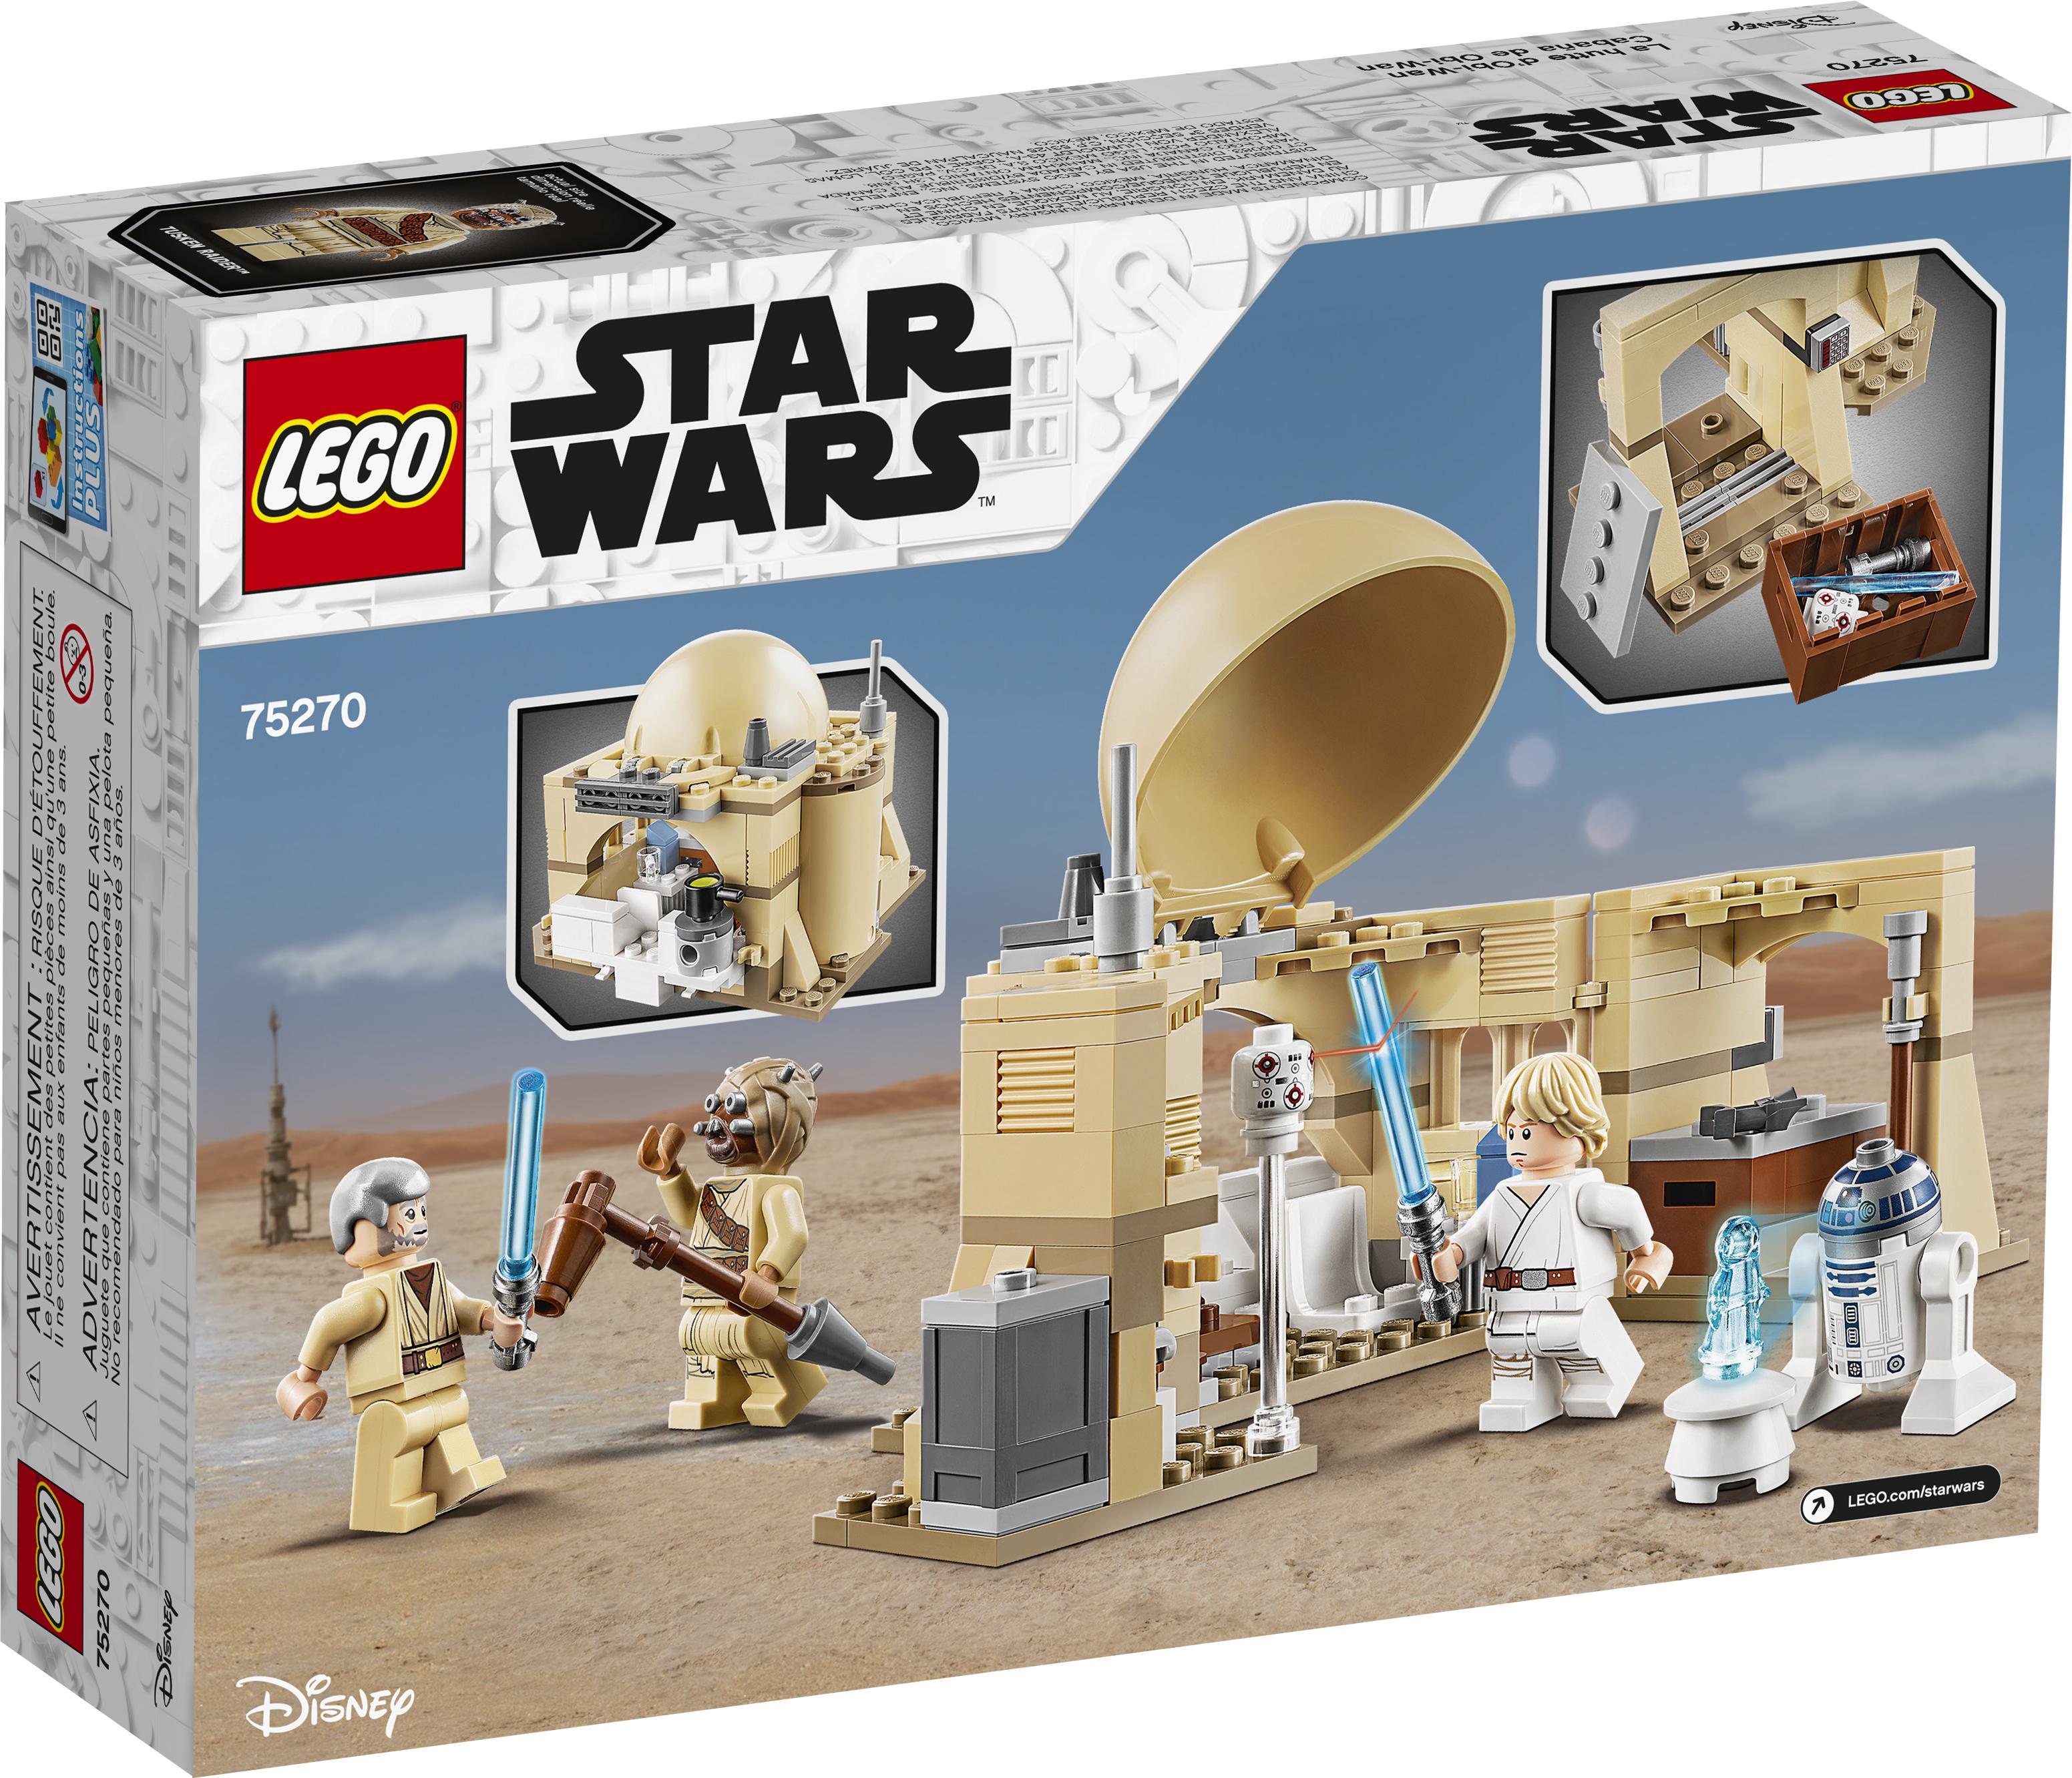 ANH Obi-Wan's Hut Lego set 2